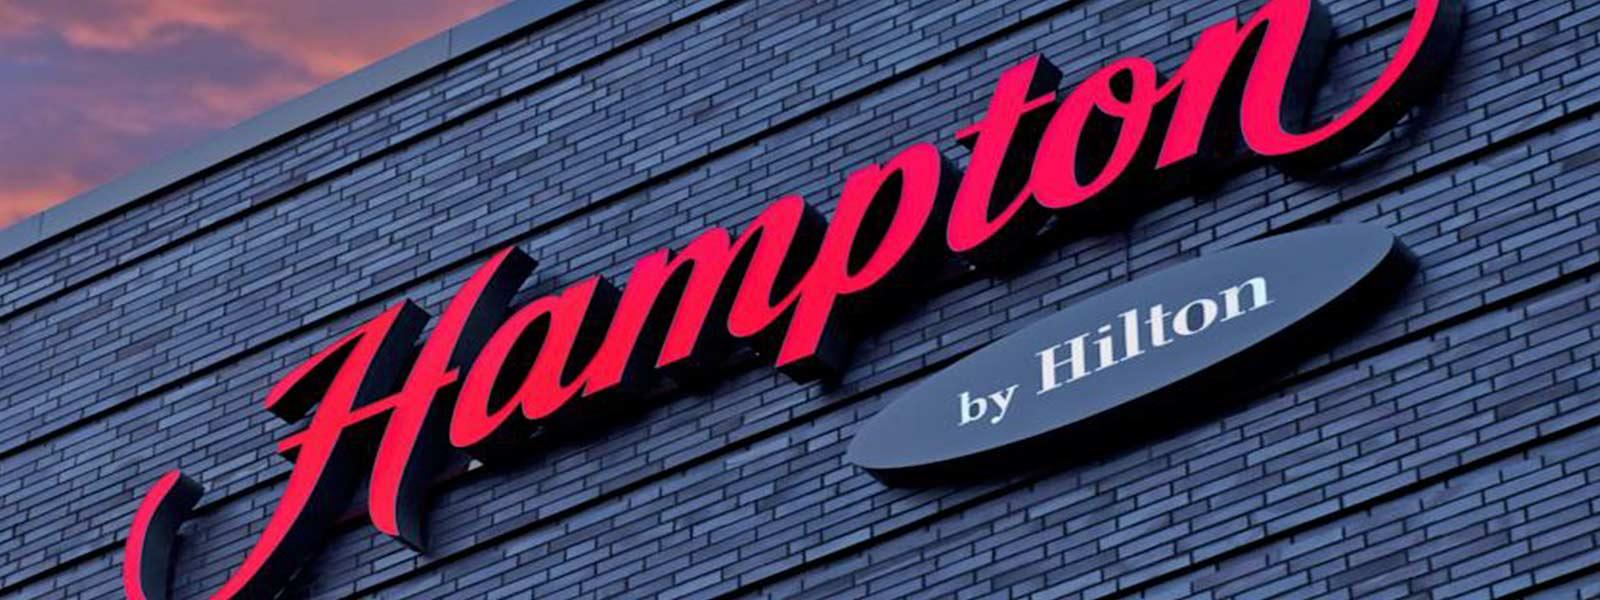 Lublin obok Hampton by Hilton   - TNGS Tomasz Karman - Biuro Obsługi Inwestora - Lublin